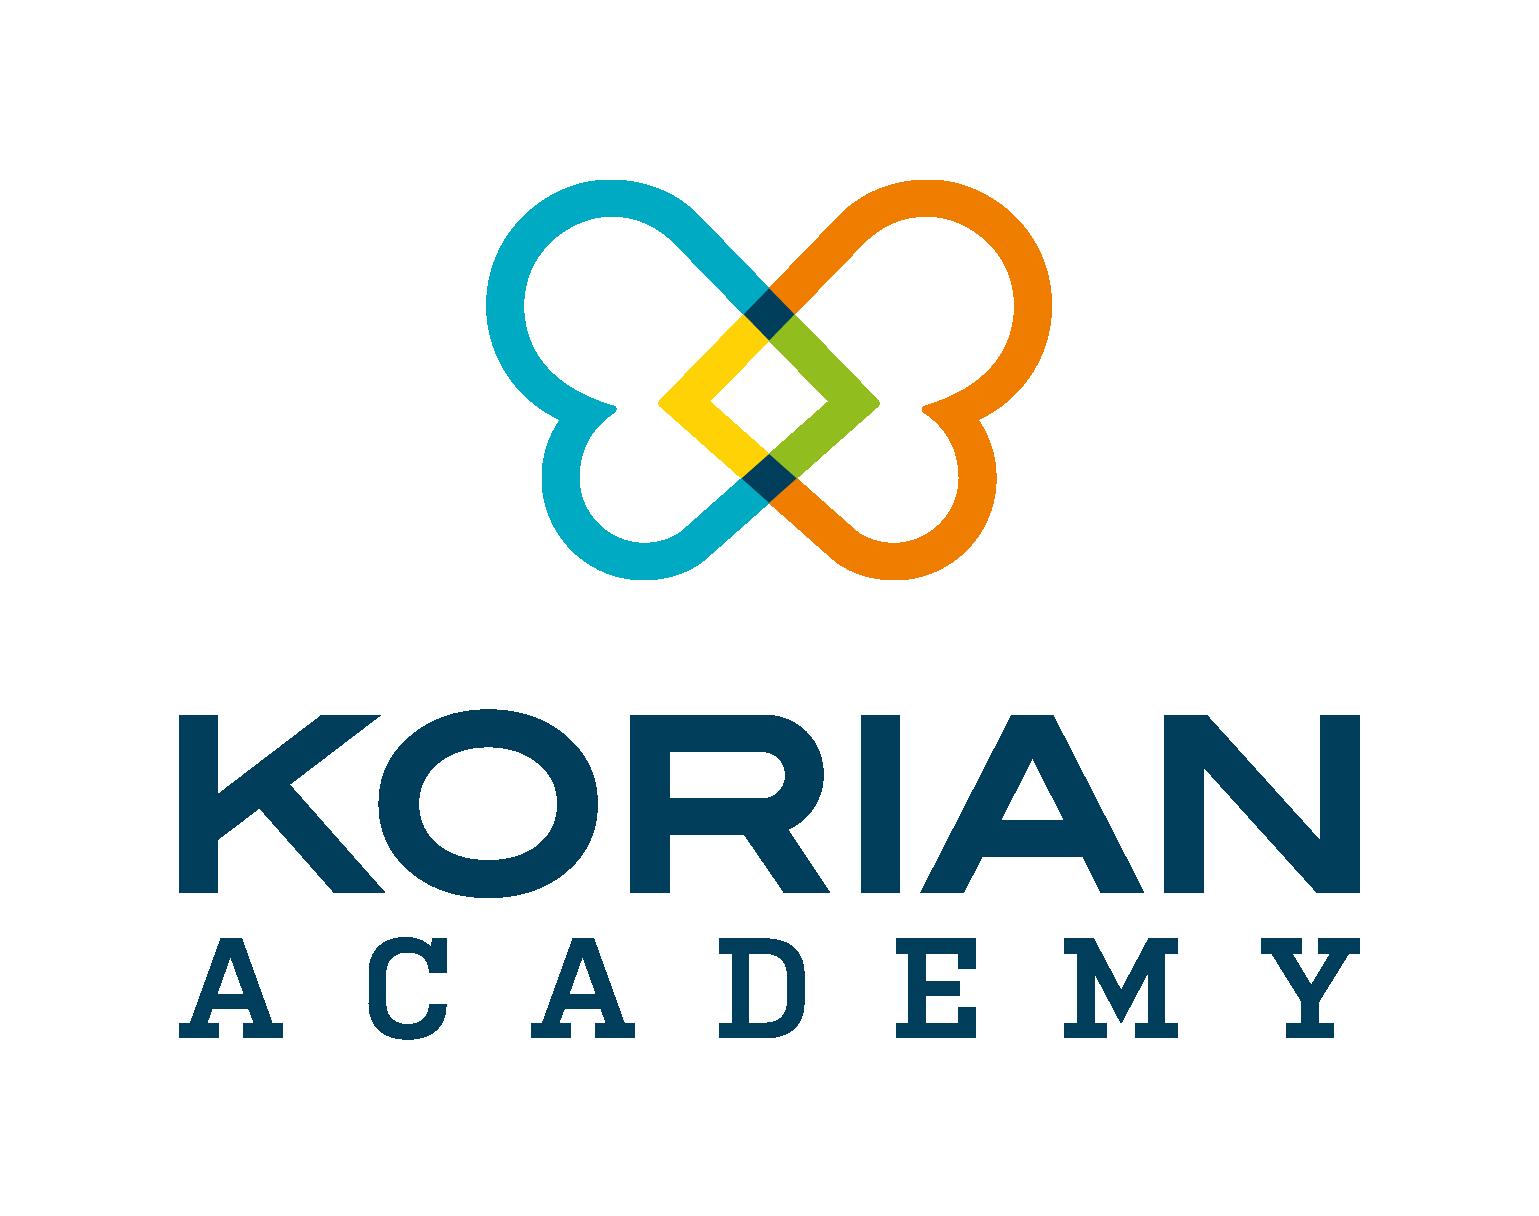 Korian Academy